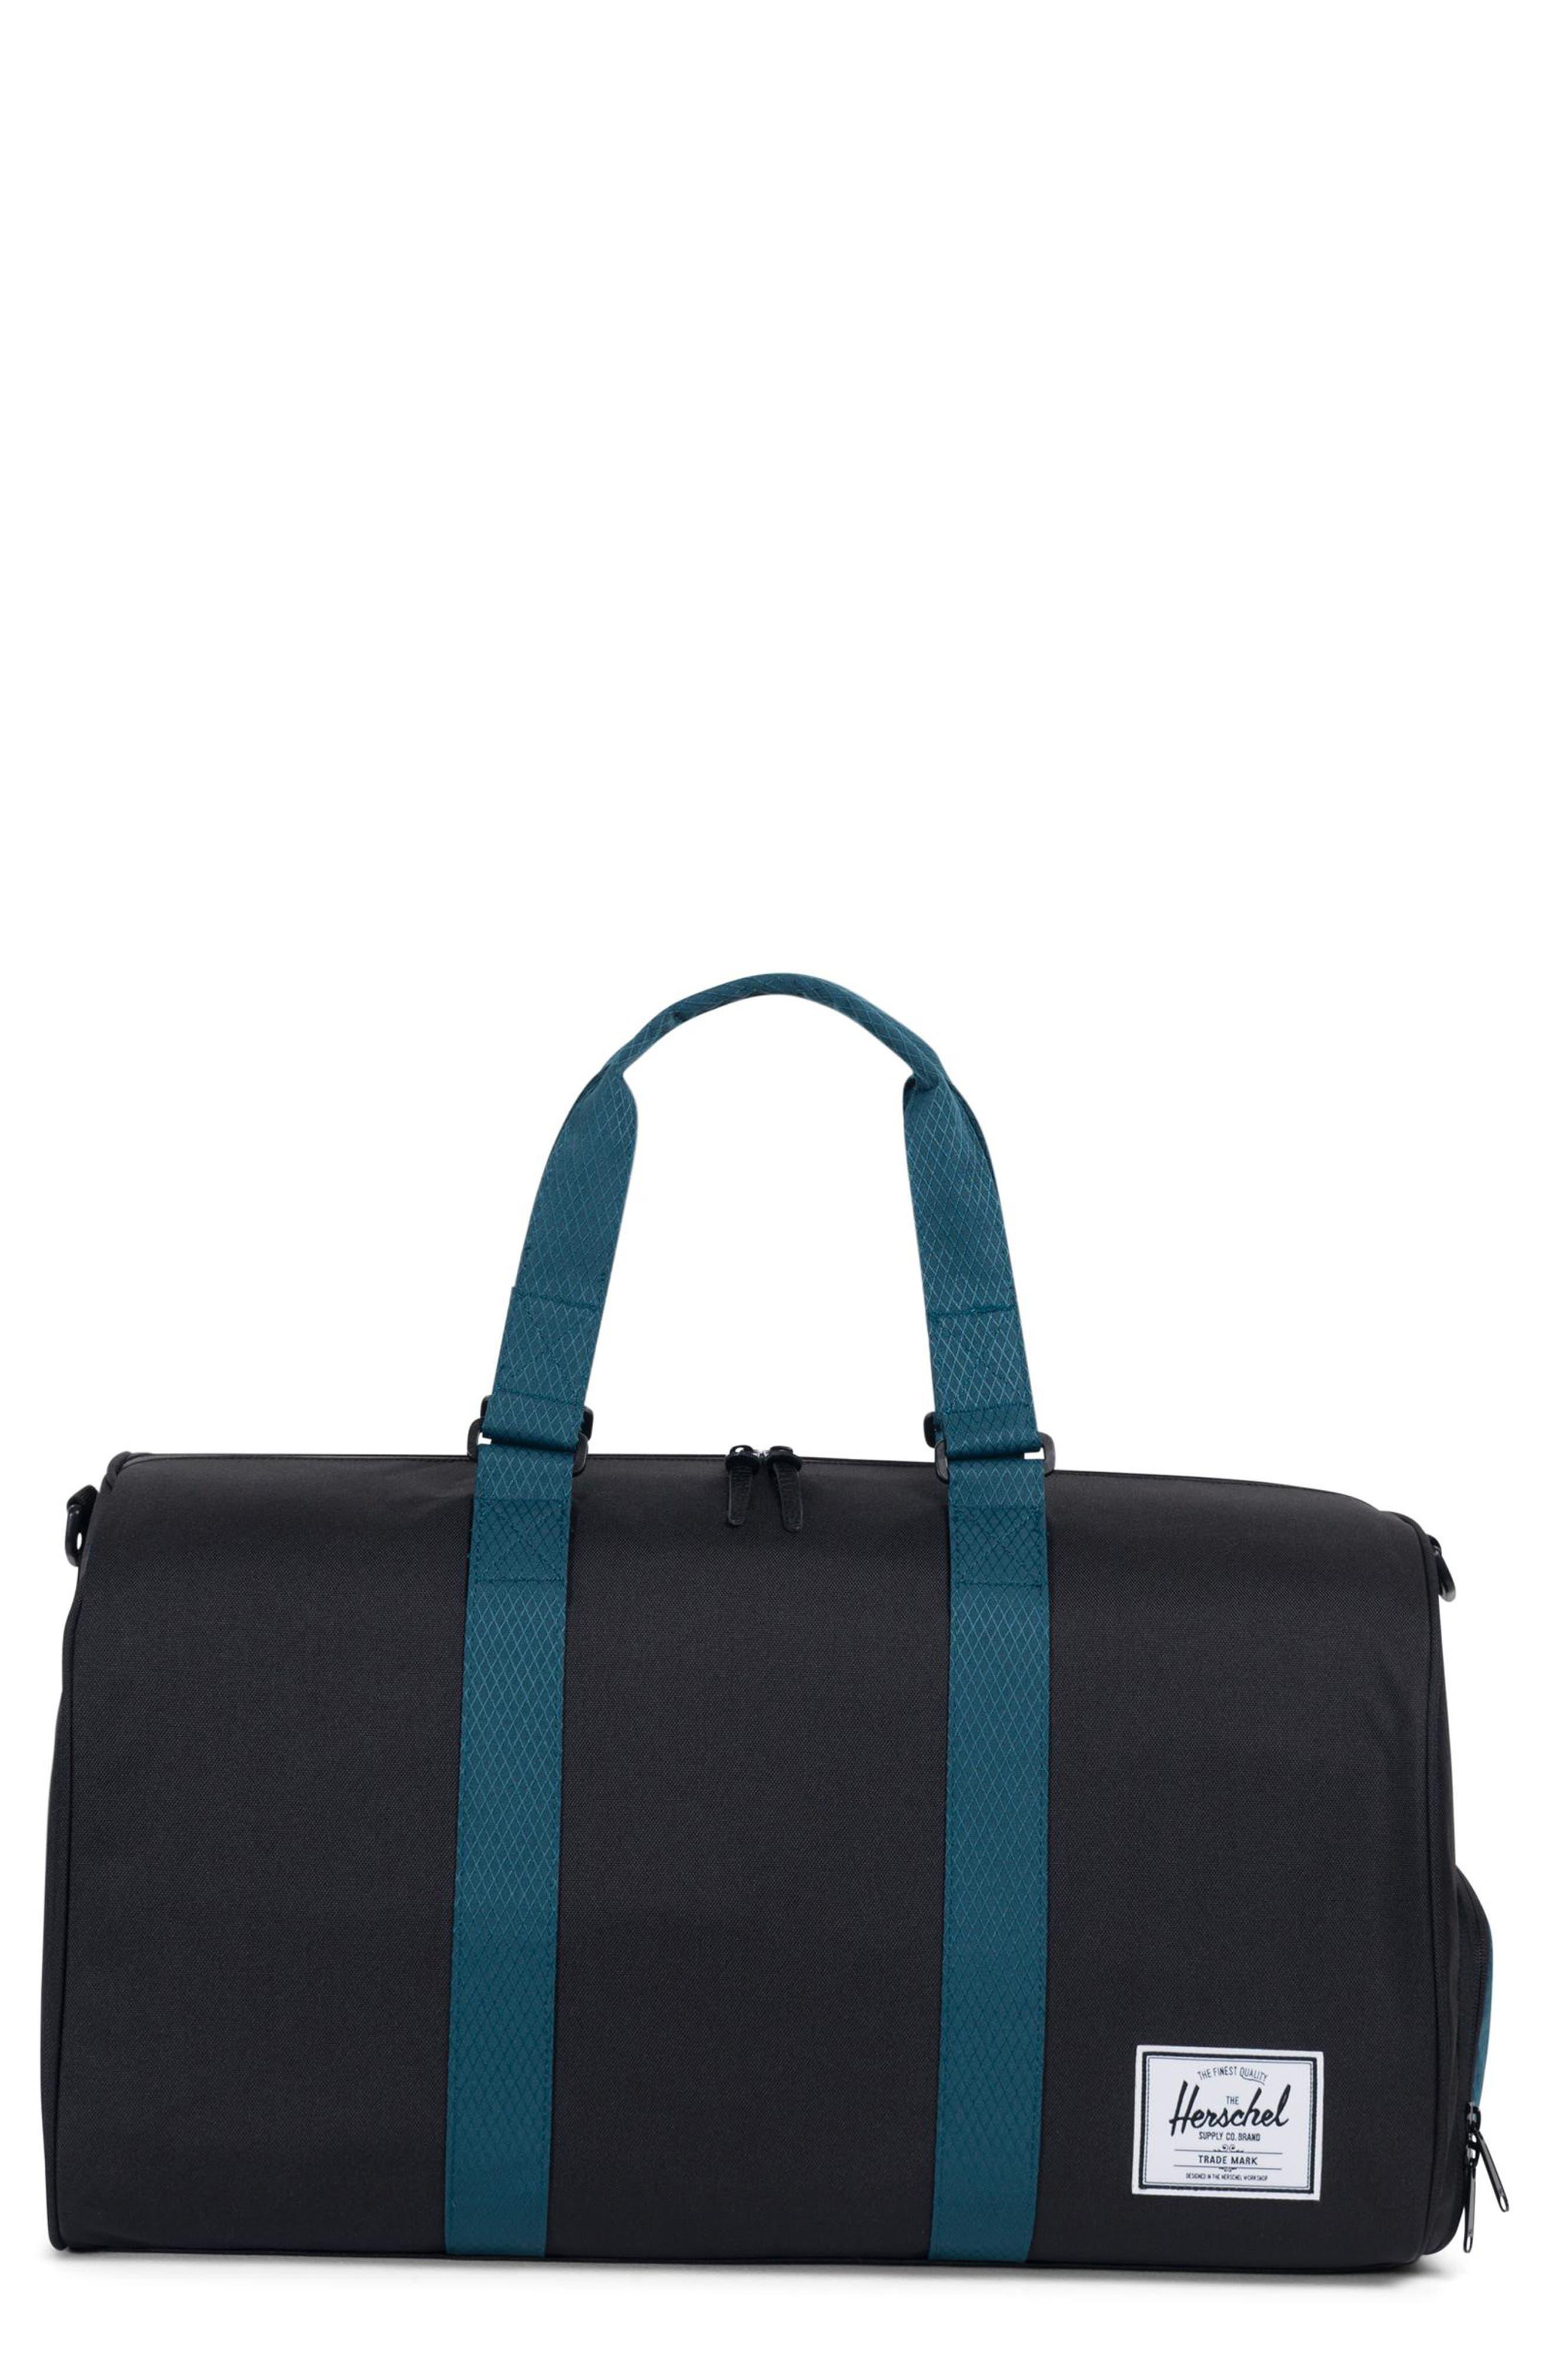 Novel Duffel Bag,                         Main,                         color, BLACK/ DEEP TEAL